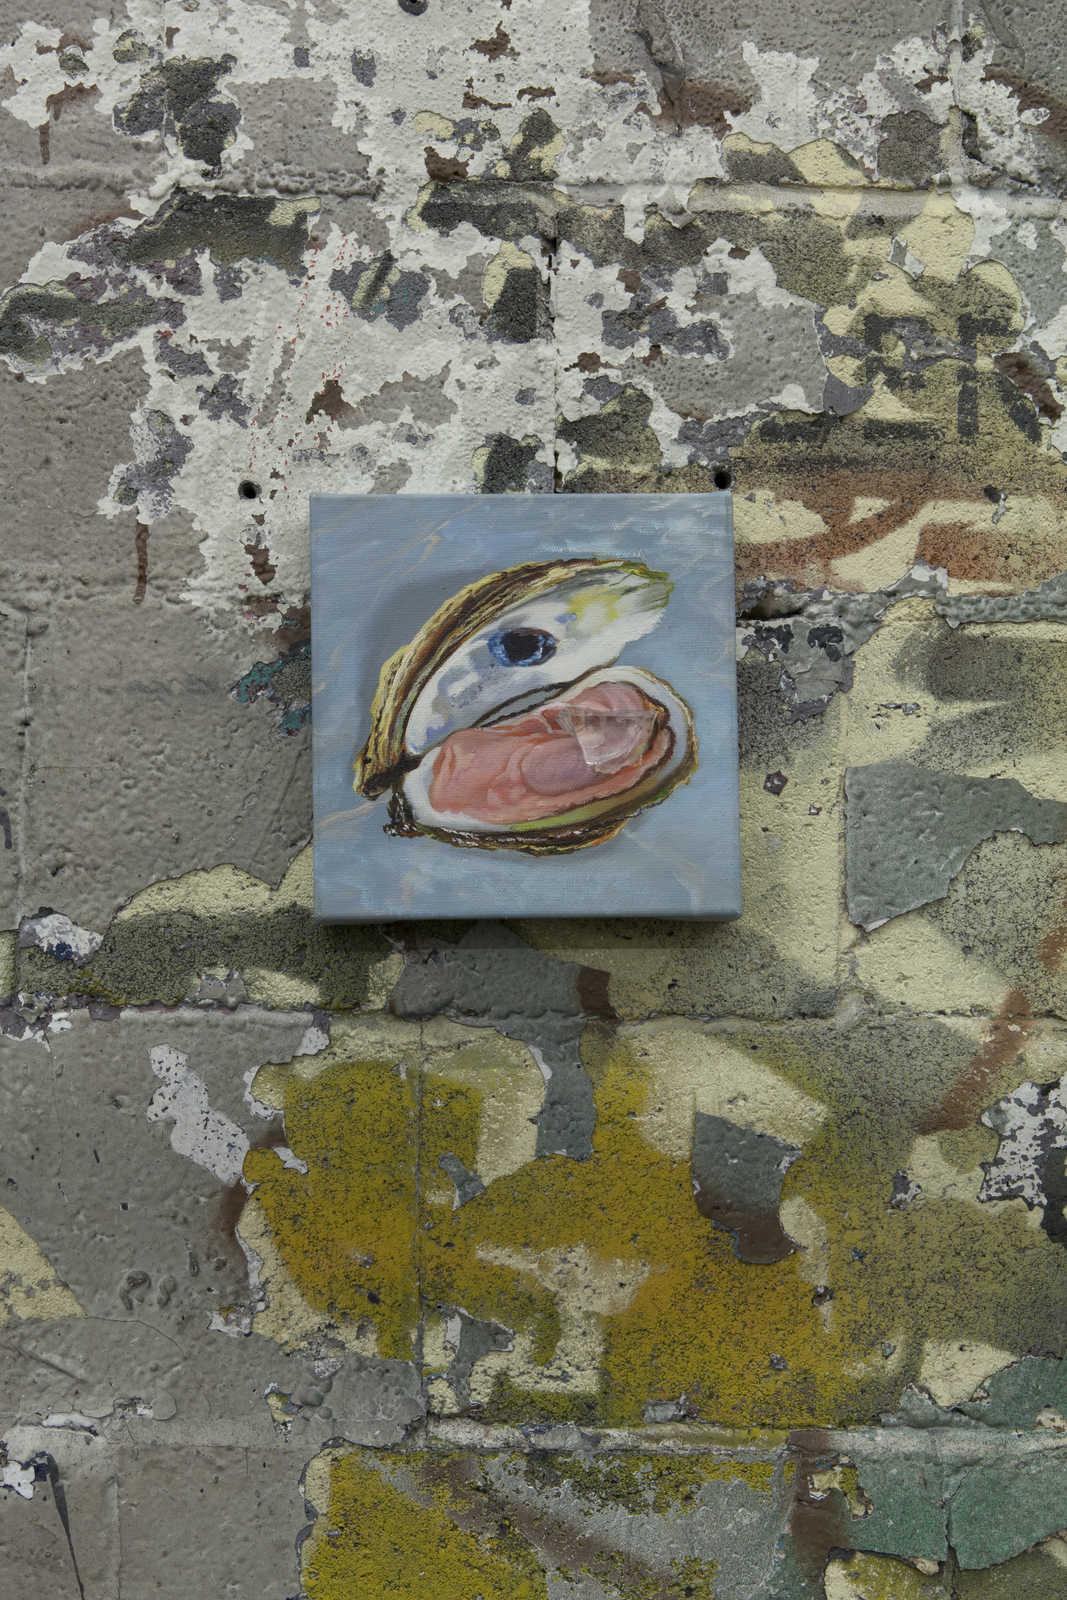 19_Alan Belcher Pearls 2 (Detail)